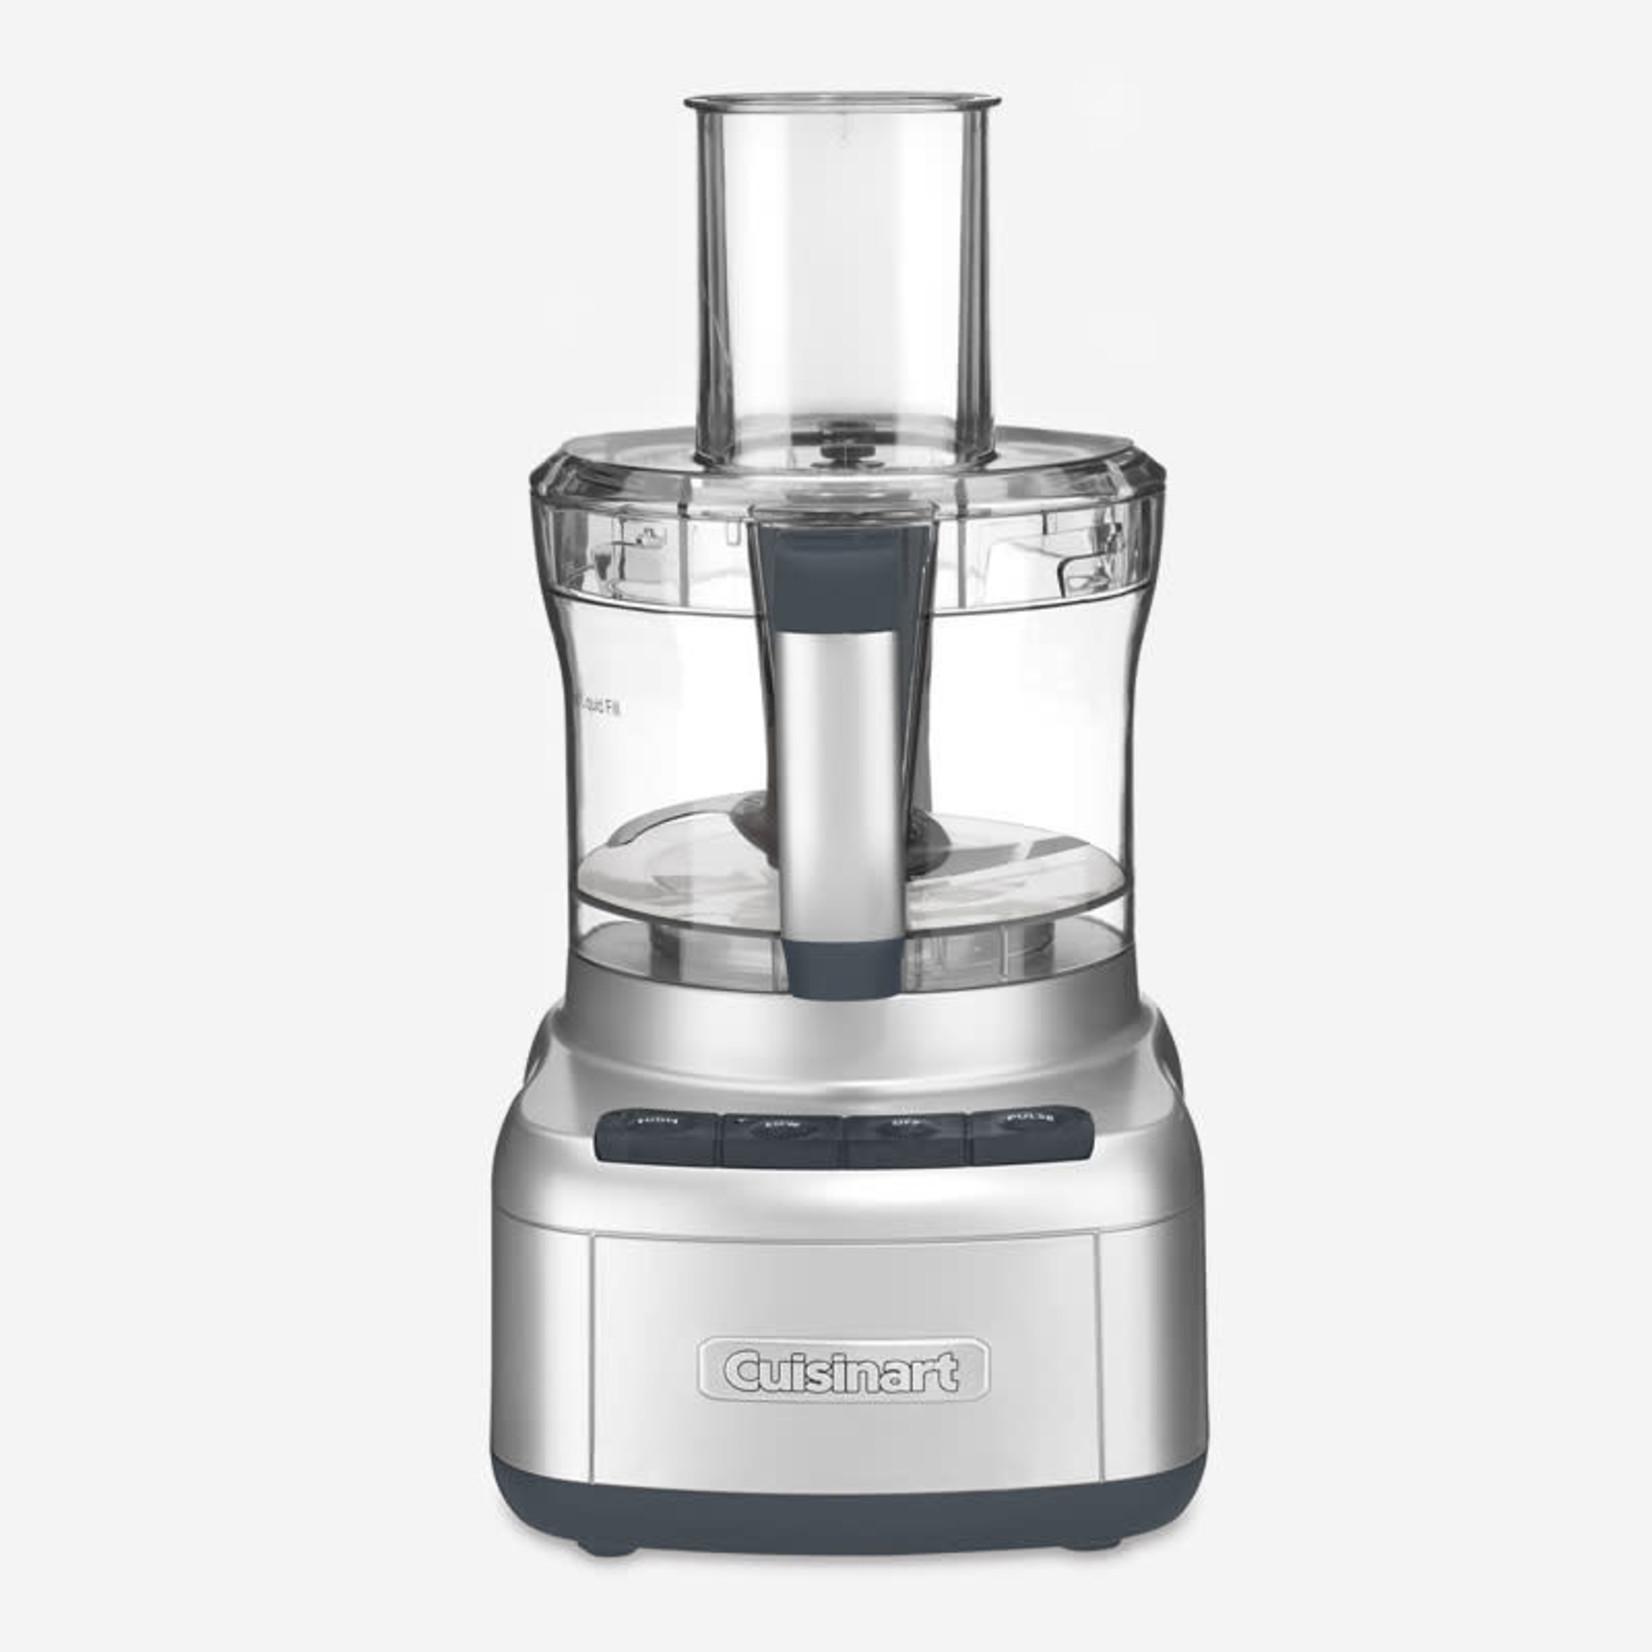 Elemental™ 8-Cup (1.9 L) Food Processor